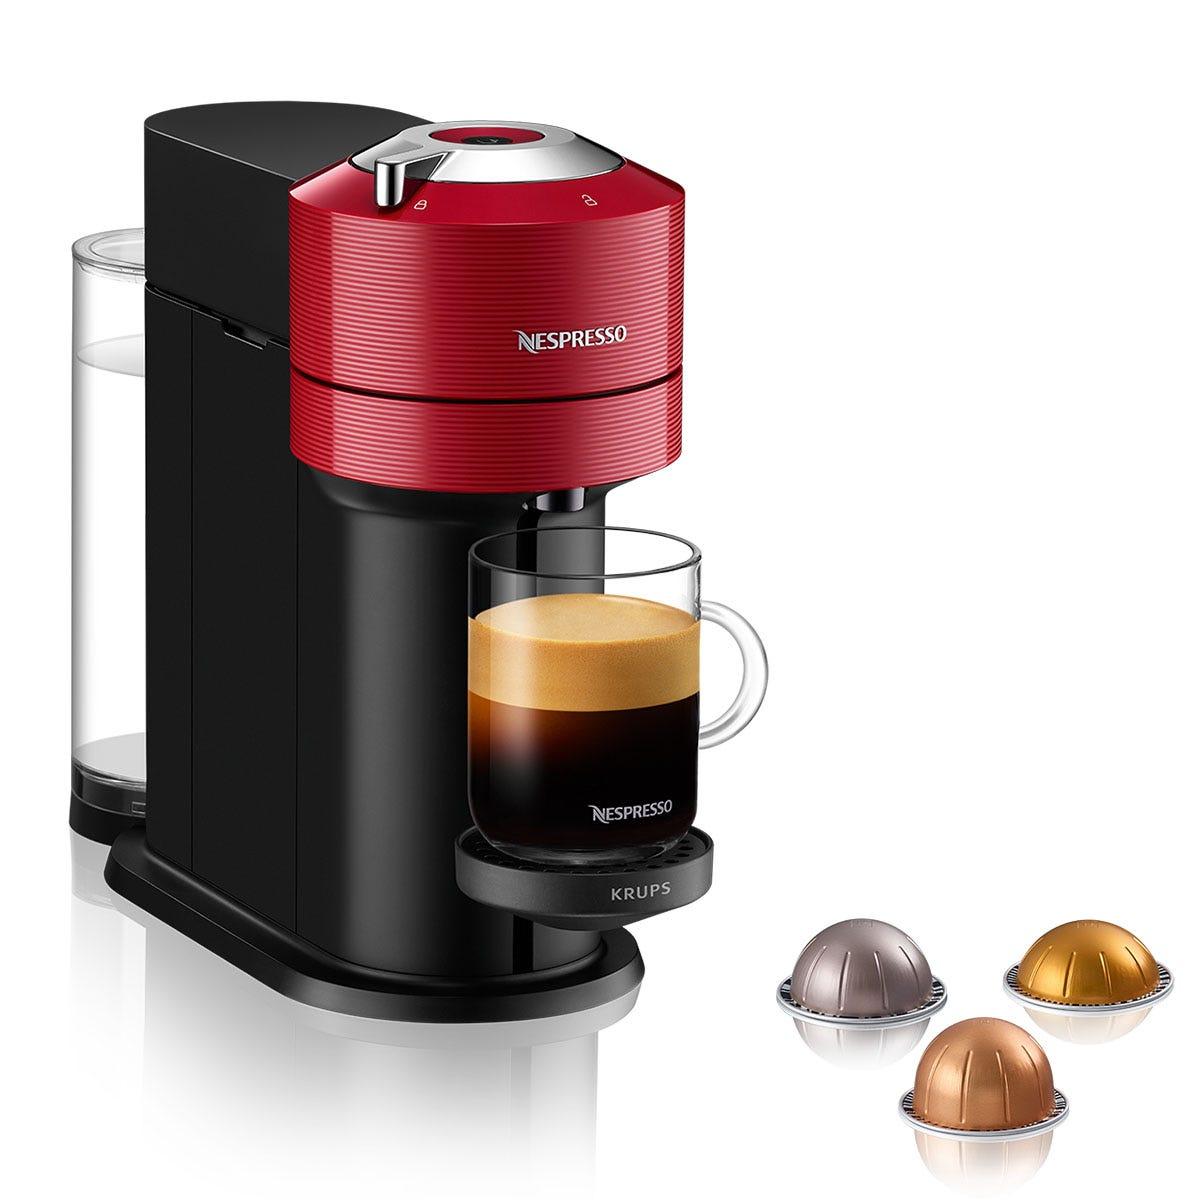 Nespresso Vertuo Krups XN910540 Coffee Machine - Red